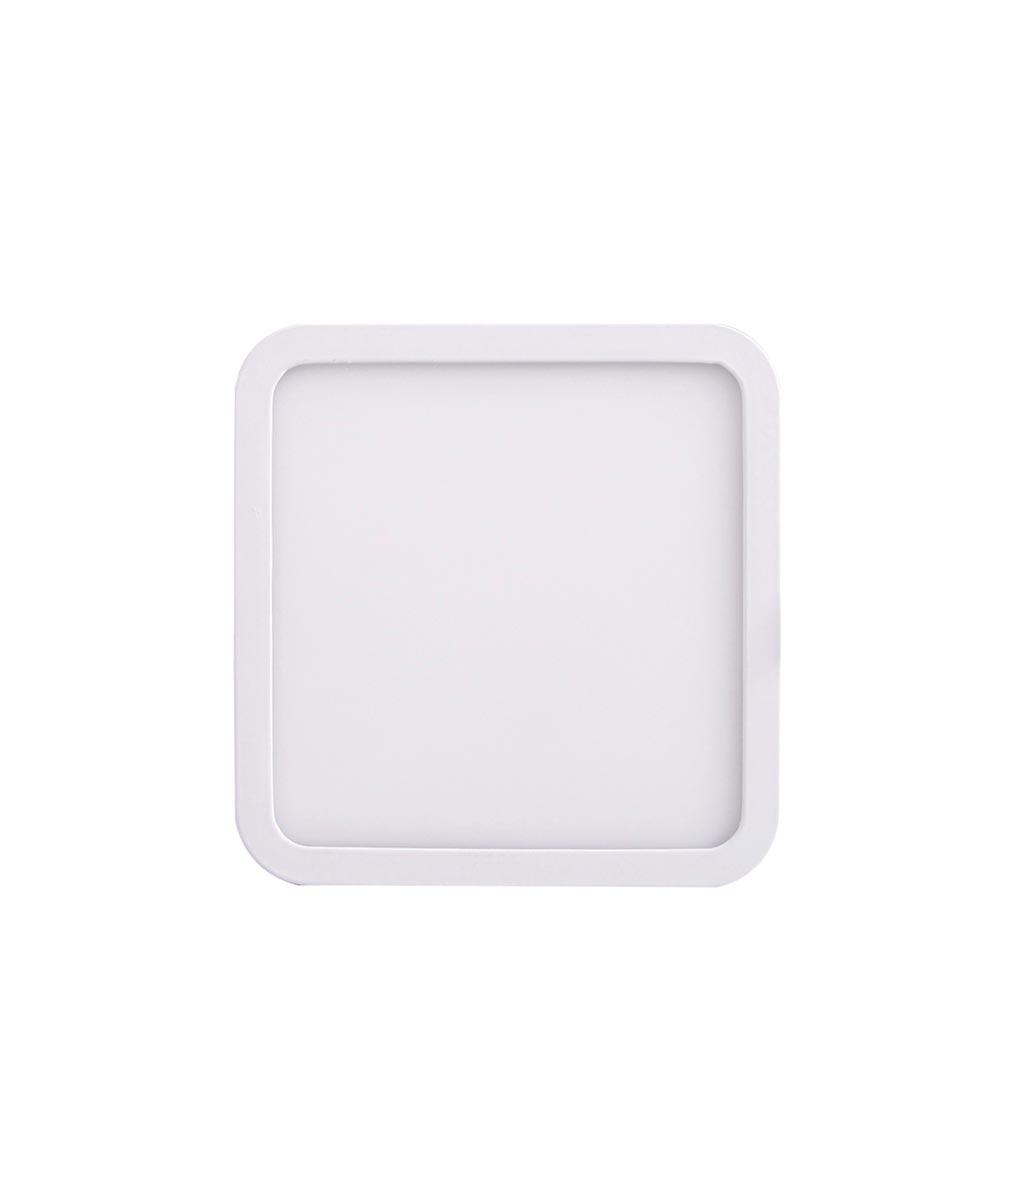 Empotrable 4000K luz neutra 12W blanco SAONA